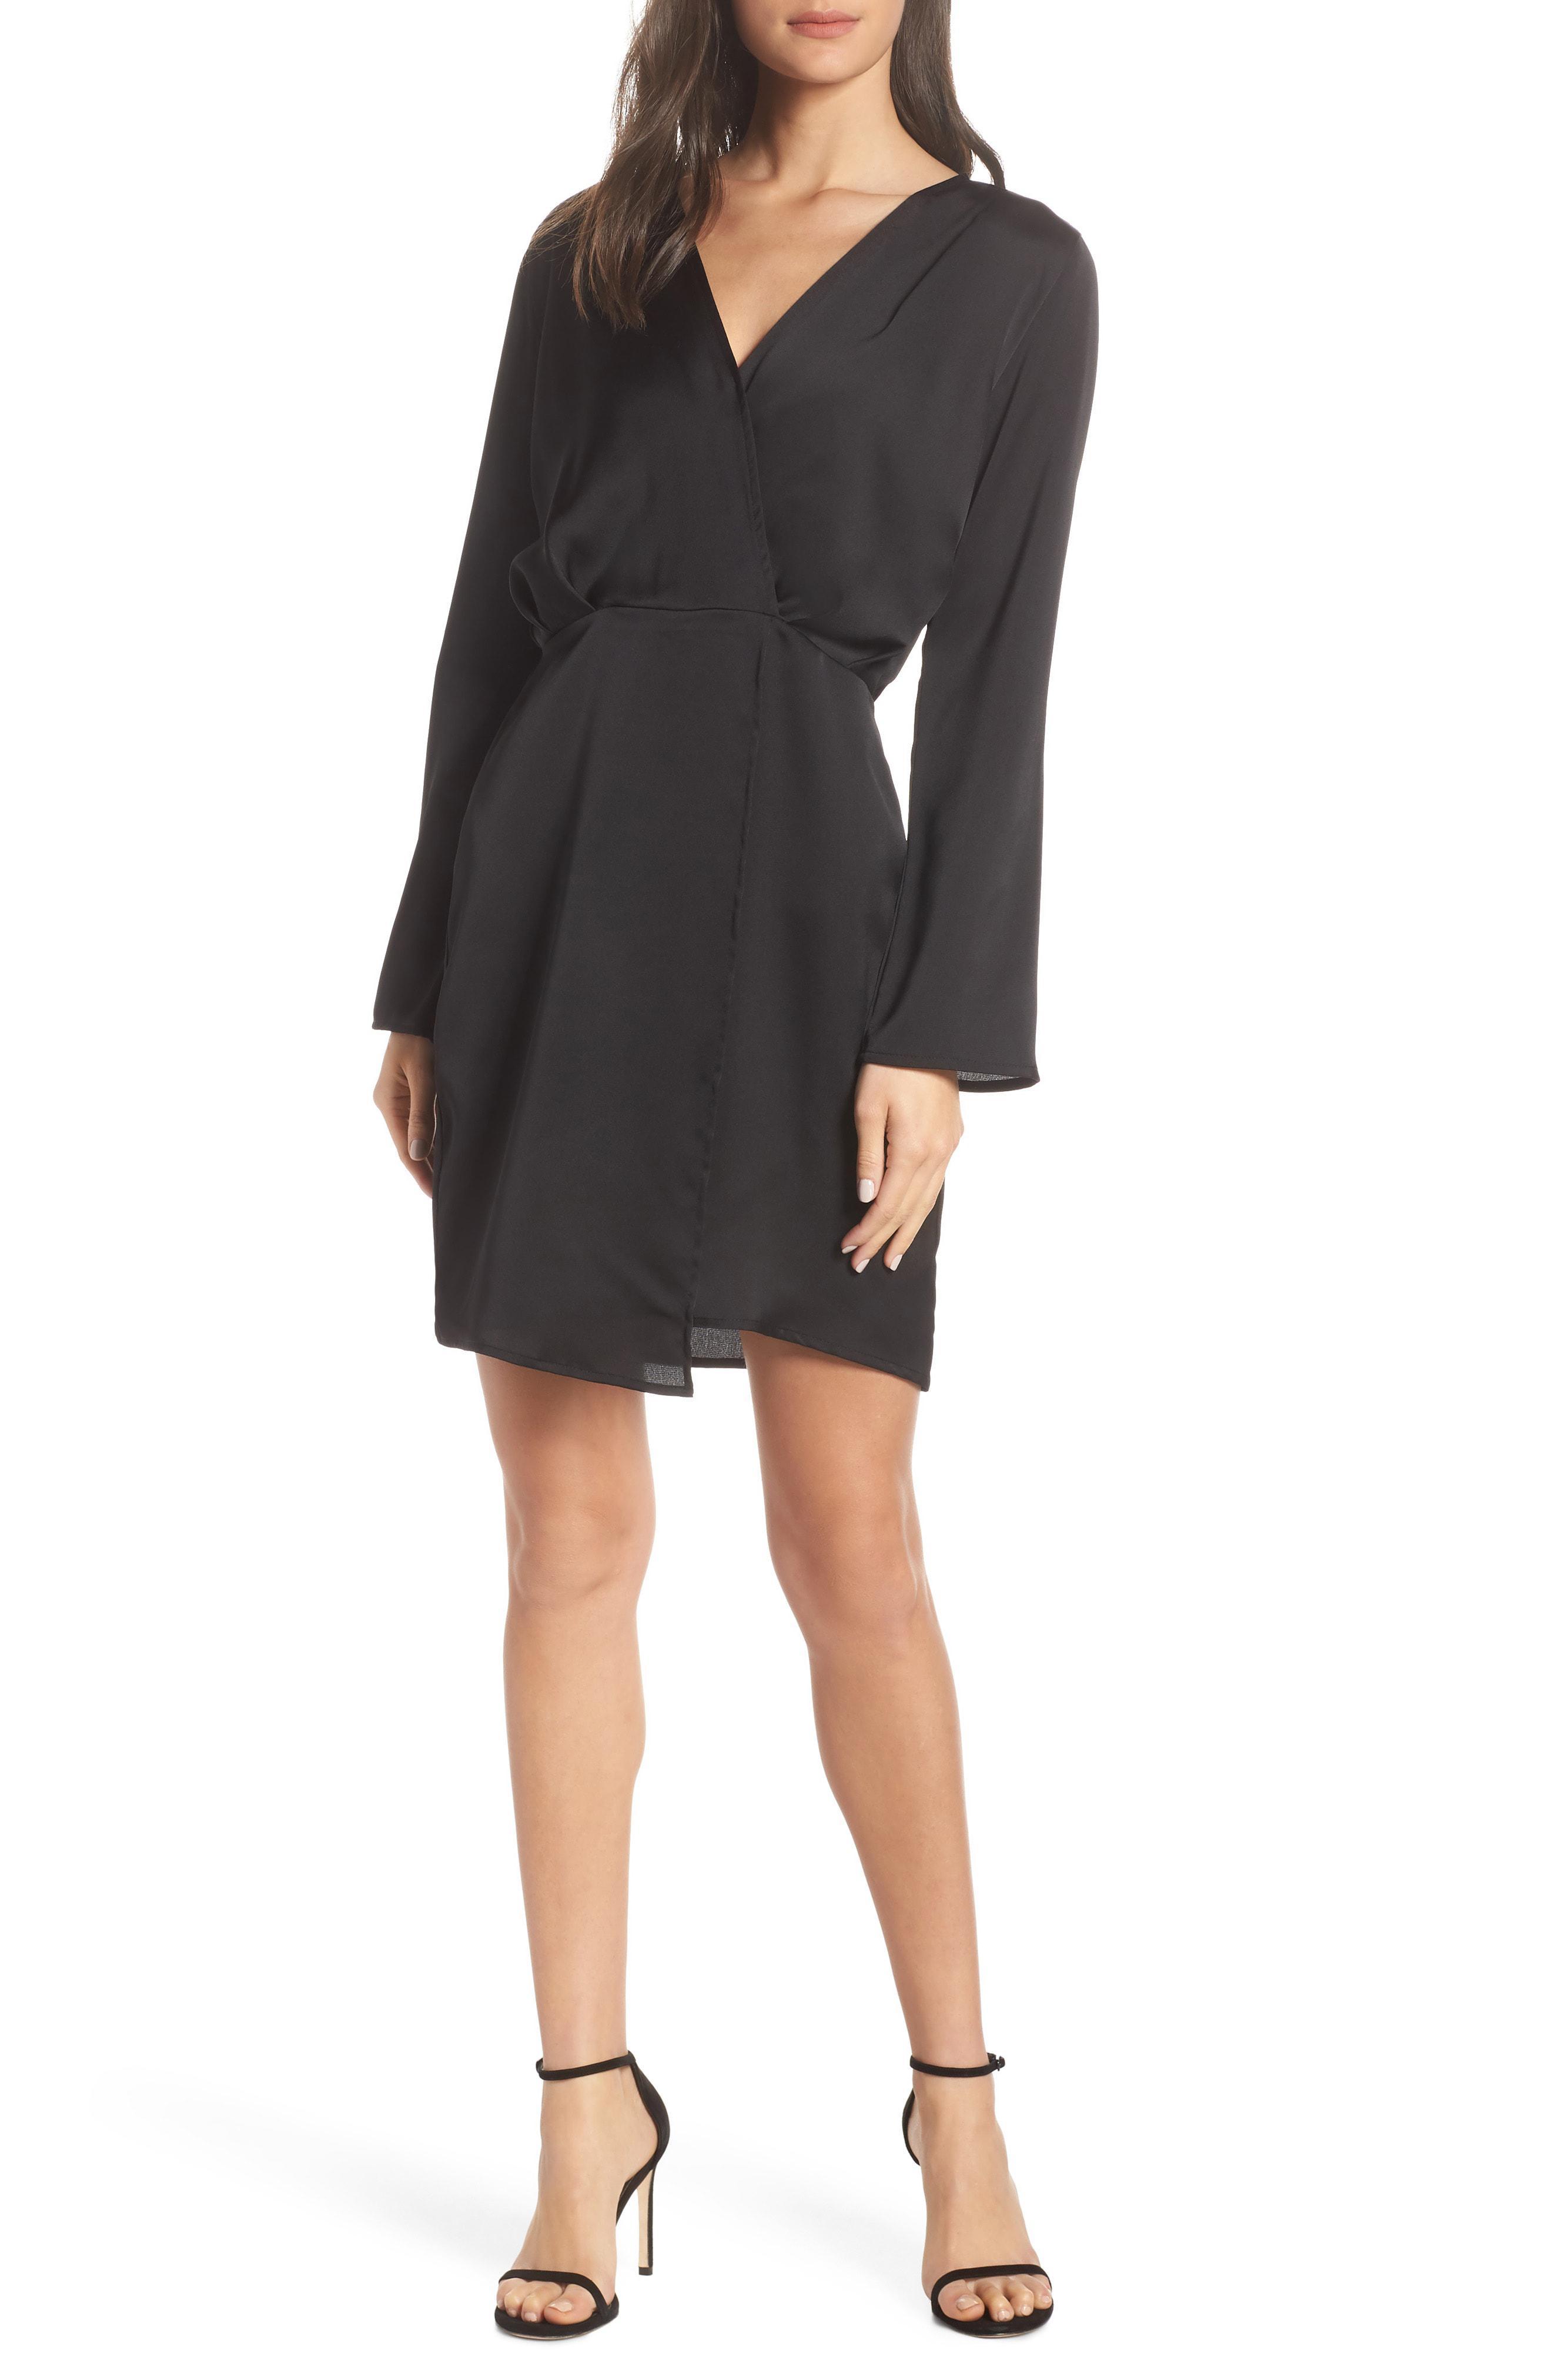 929db93fff7d Lyst - Fraiche By J Satin Dress in Black